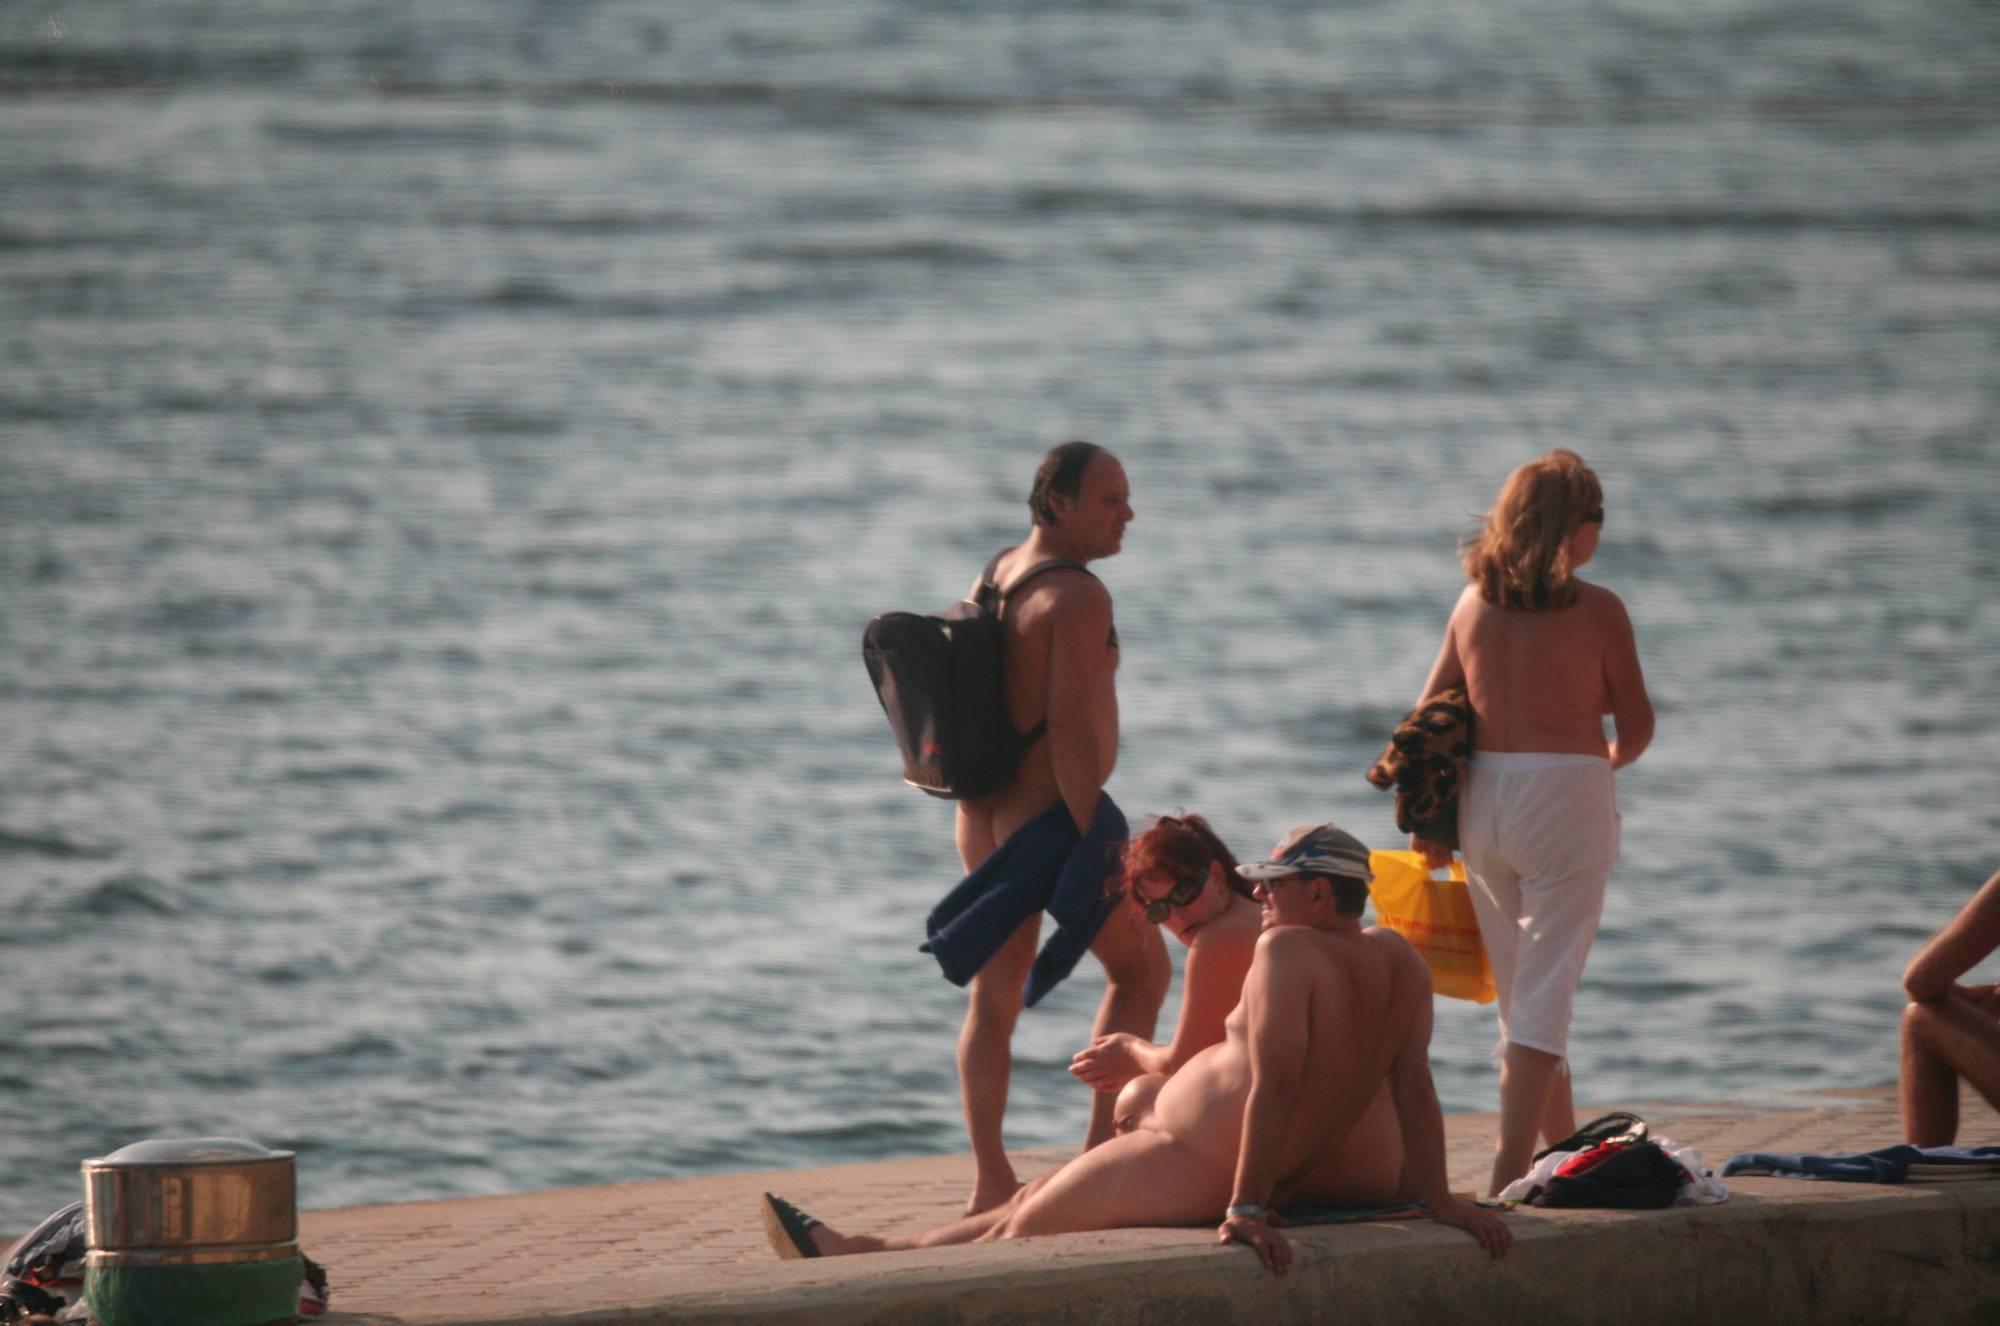 Bares Naturist Beach Slab - 2